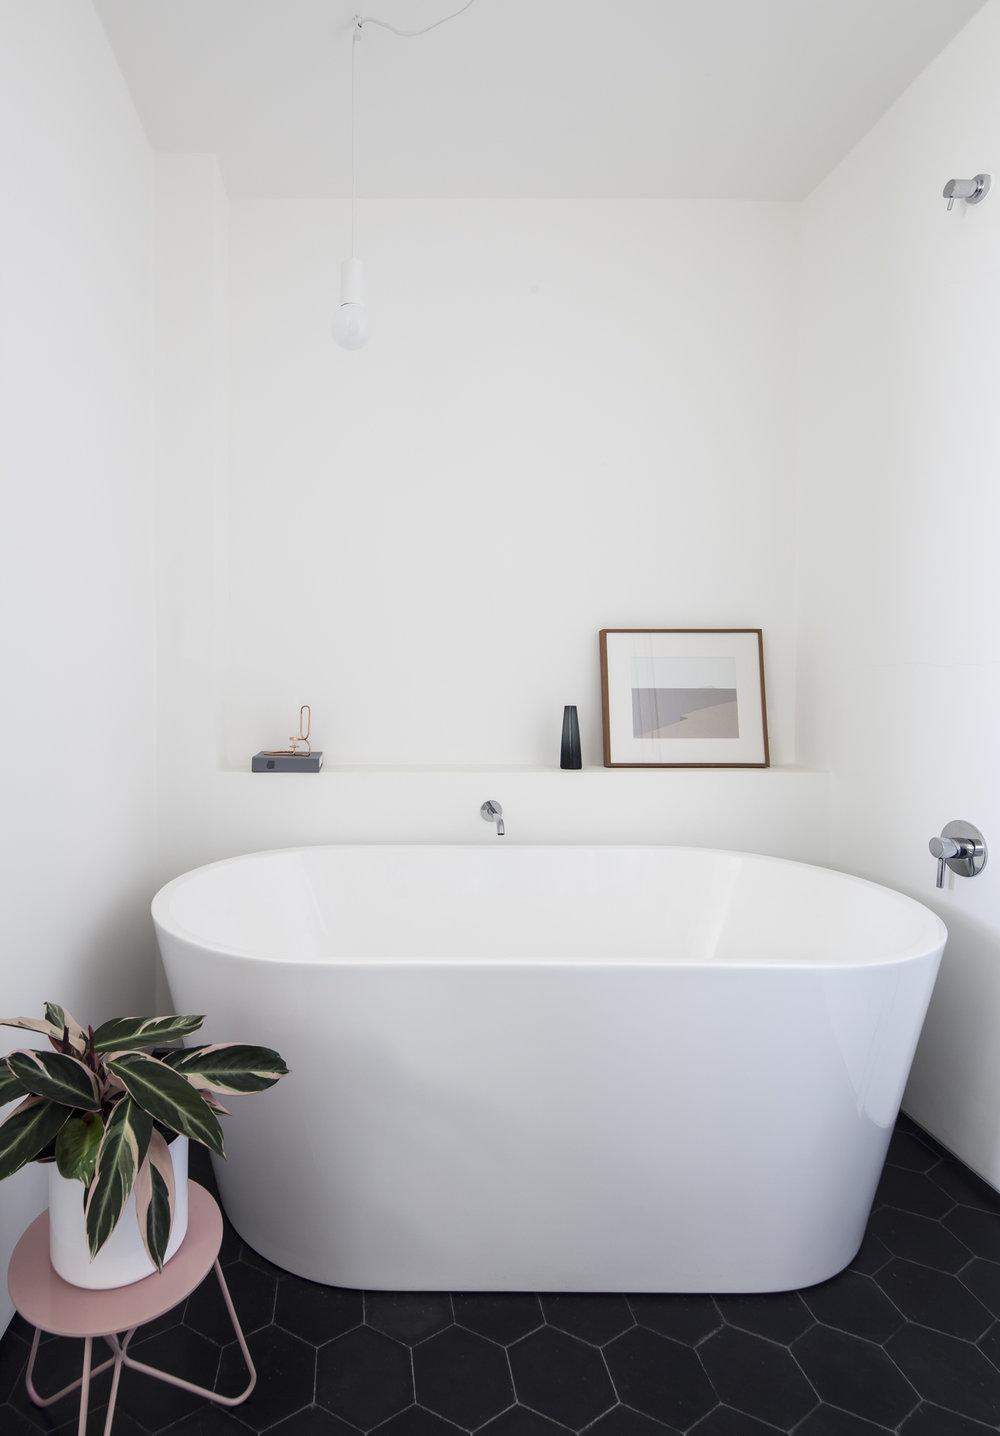 banhos rb - estudio nodo-4.jpg